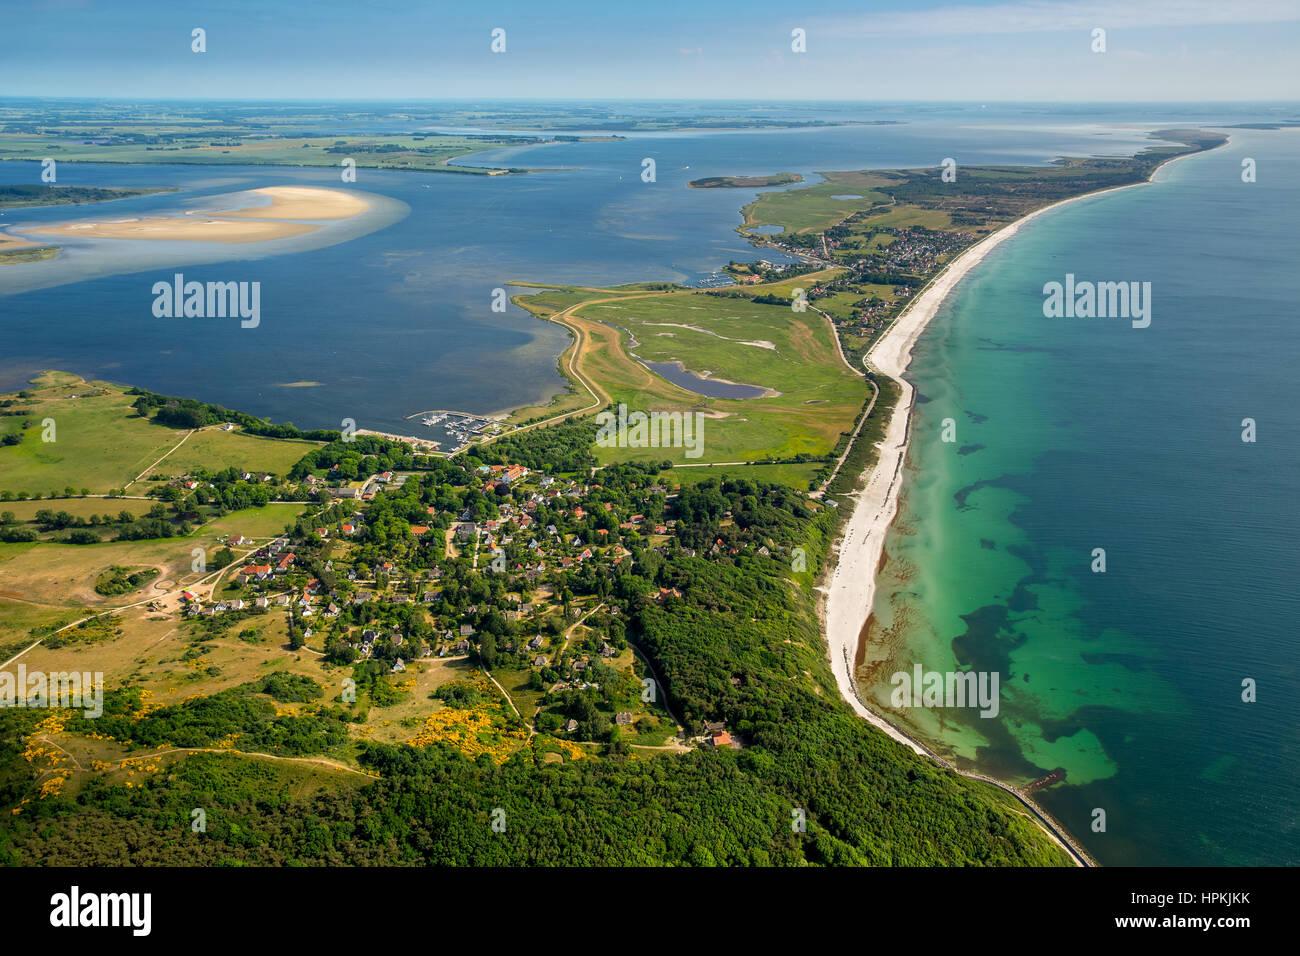 Bay and port of Vitte, beach, beach line, monastery, island Hiddensee, East seacoast, Western Pomerania, Mecklenburg - Stock Image